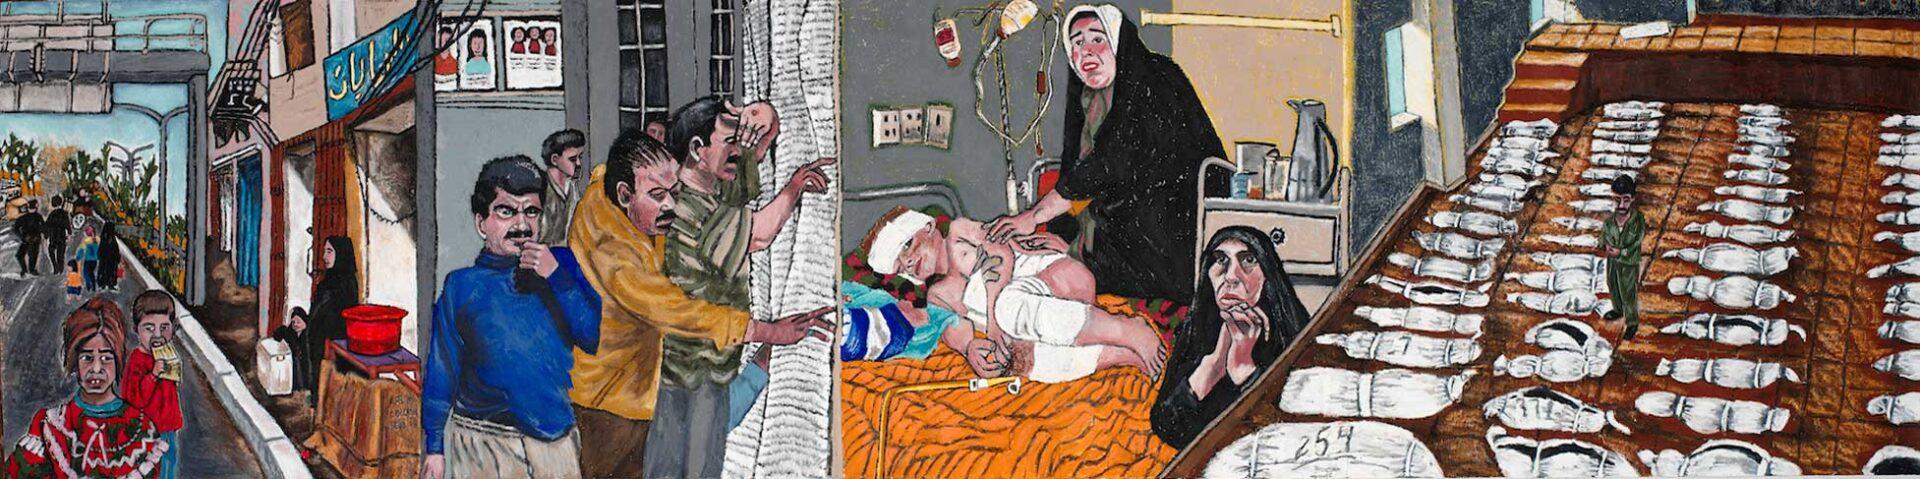 Occupation Series: Mural #3: Hospital